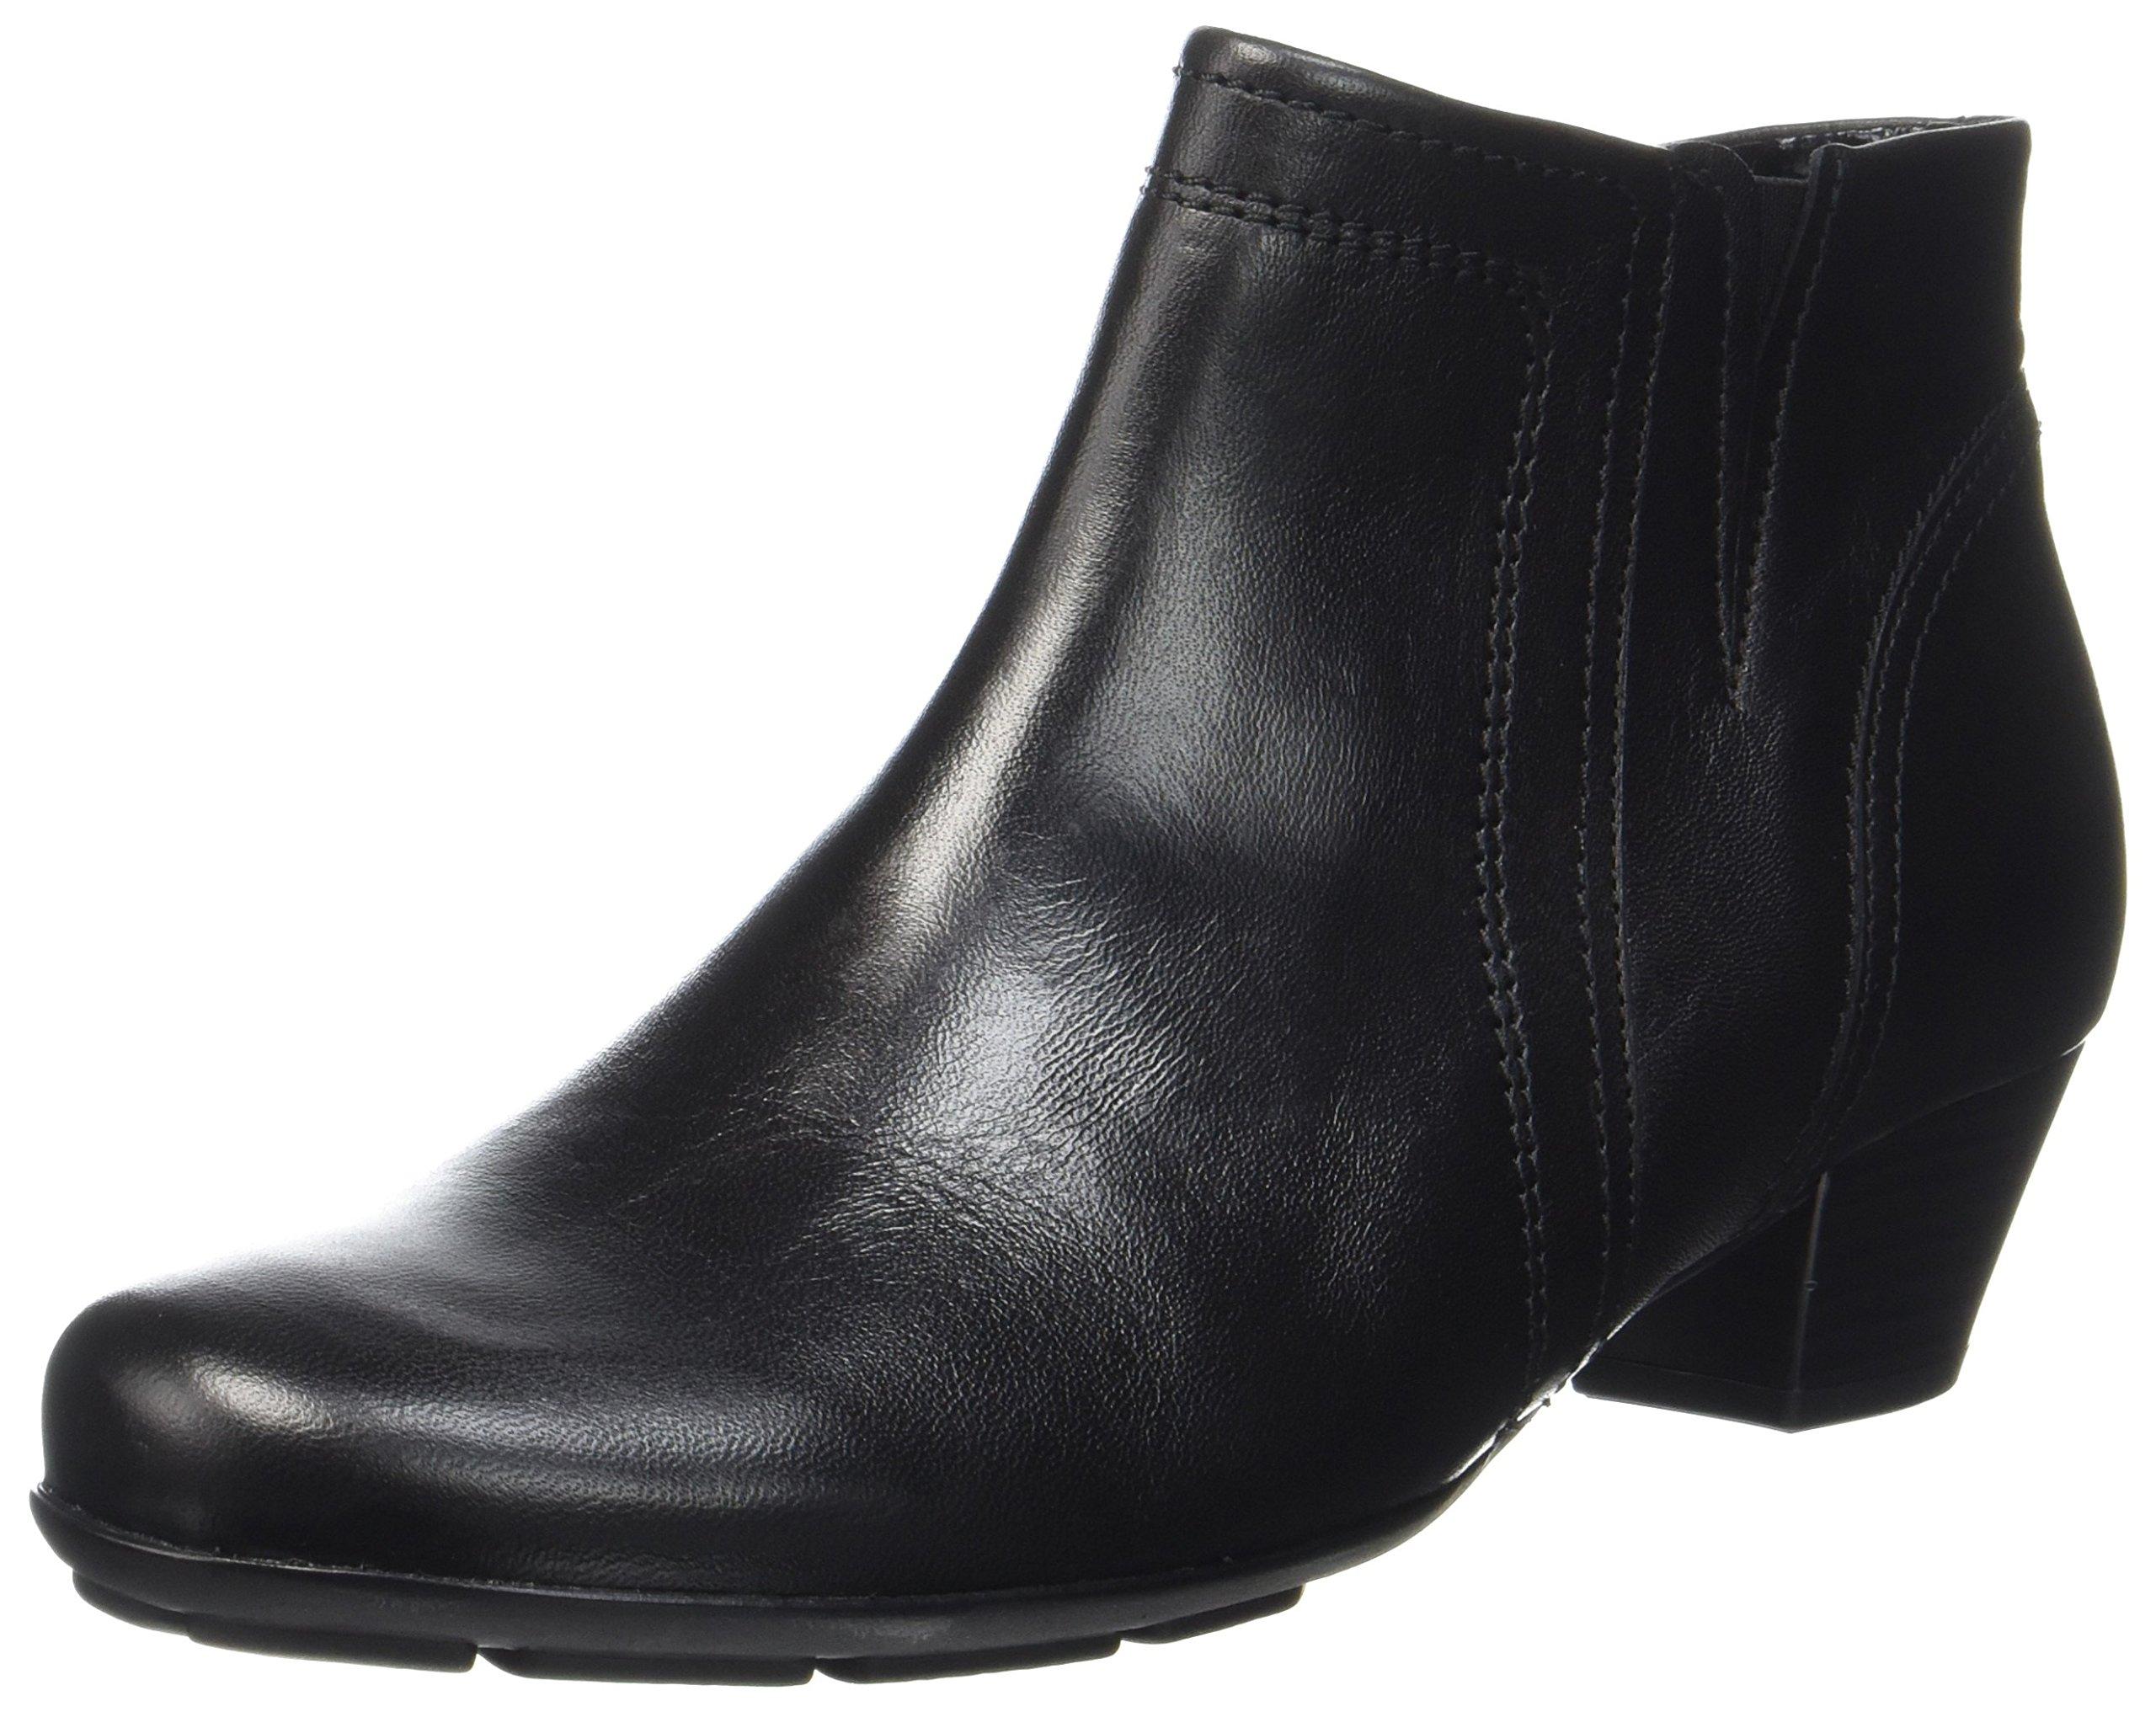 BasicBottes Gabor 5 Eu Shoes Schwarz37 FemmeNoir27 k0wPnO